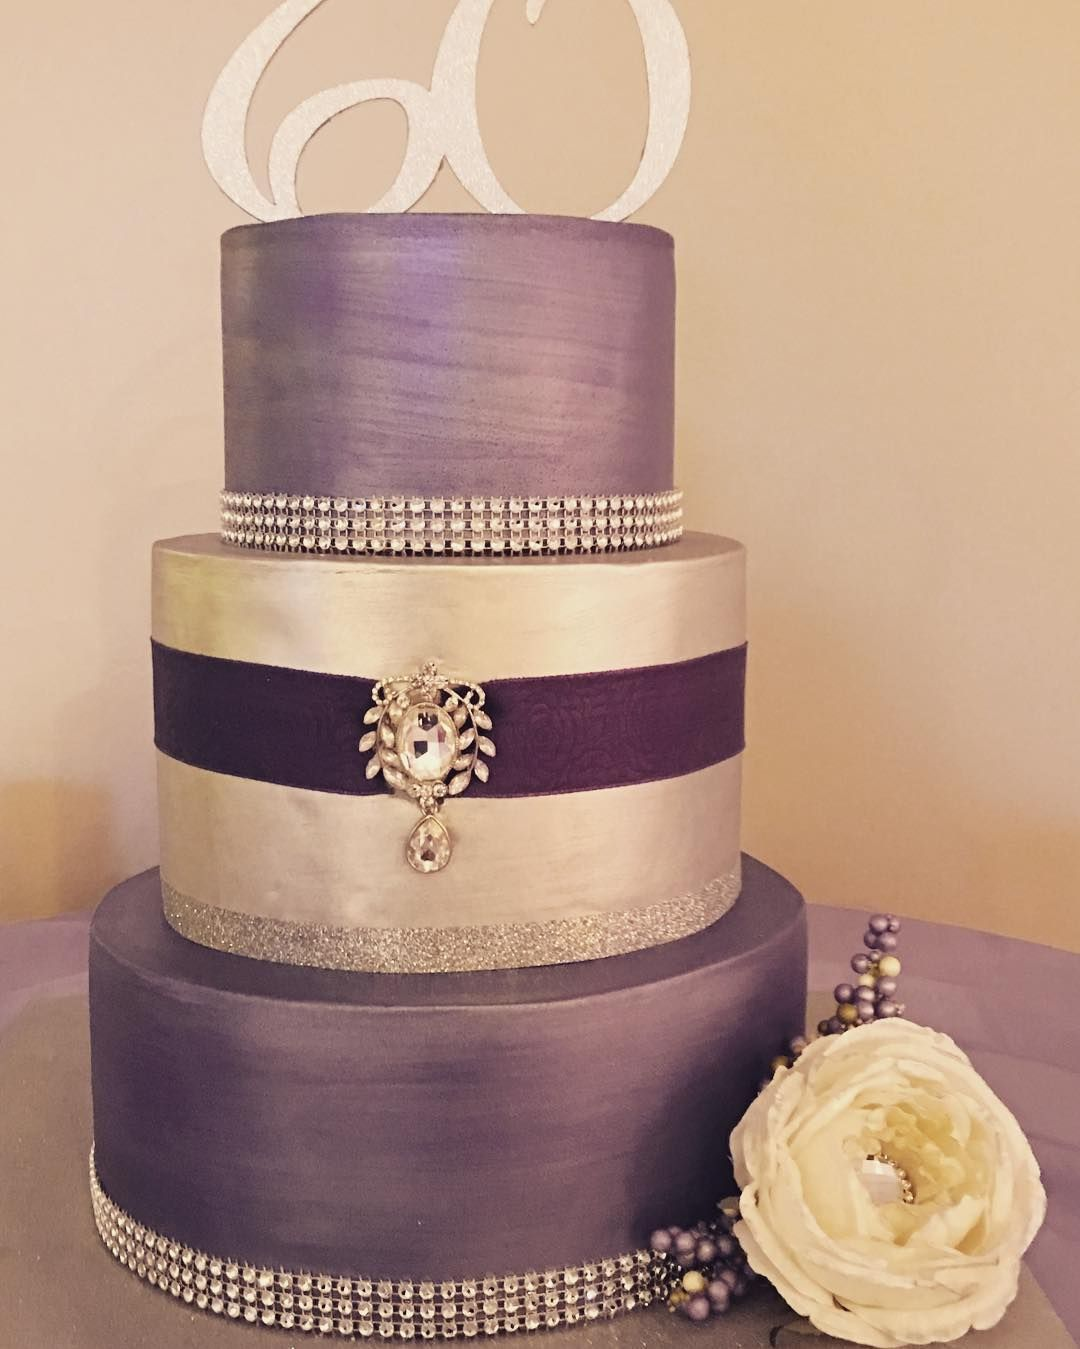 3 Tier Purple And Silver Metallic 60th Birthday Cake